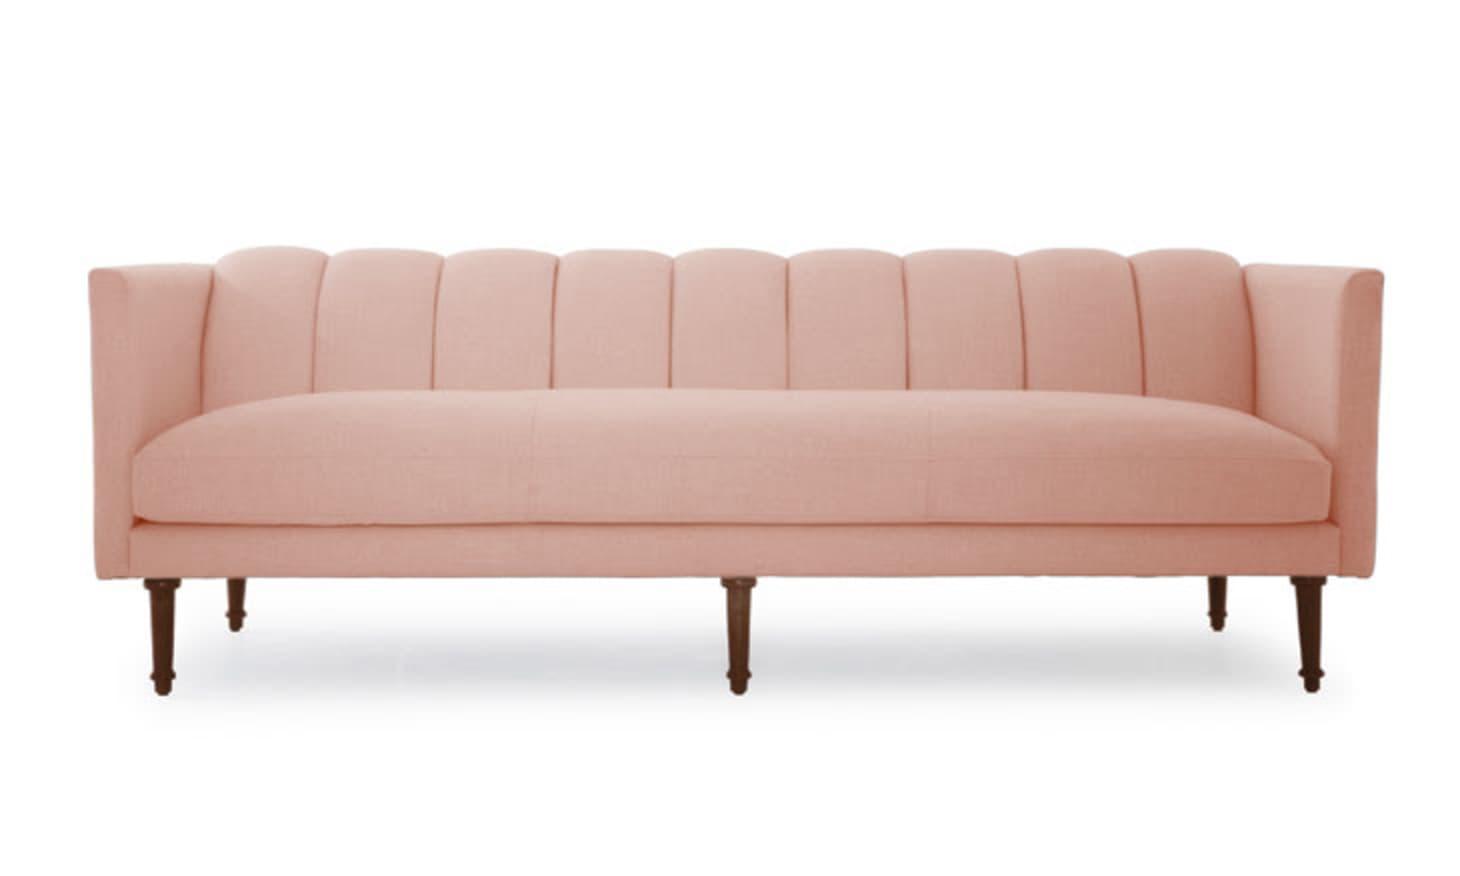 Wondrous Reviewed The Most Comfortable Sofas At Joybird Apartment Machost Co Dining Chair Design Ideas Machostcouk